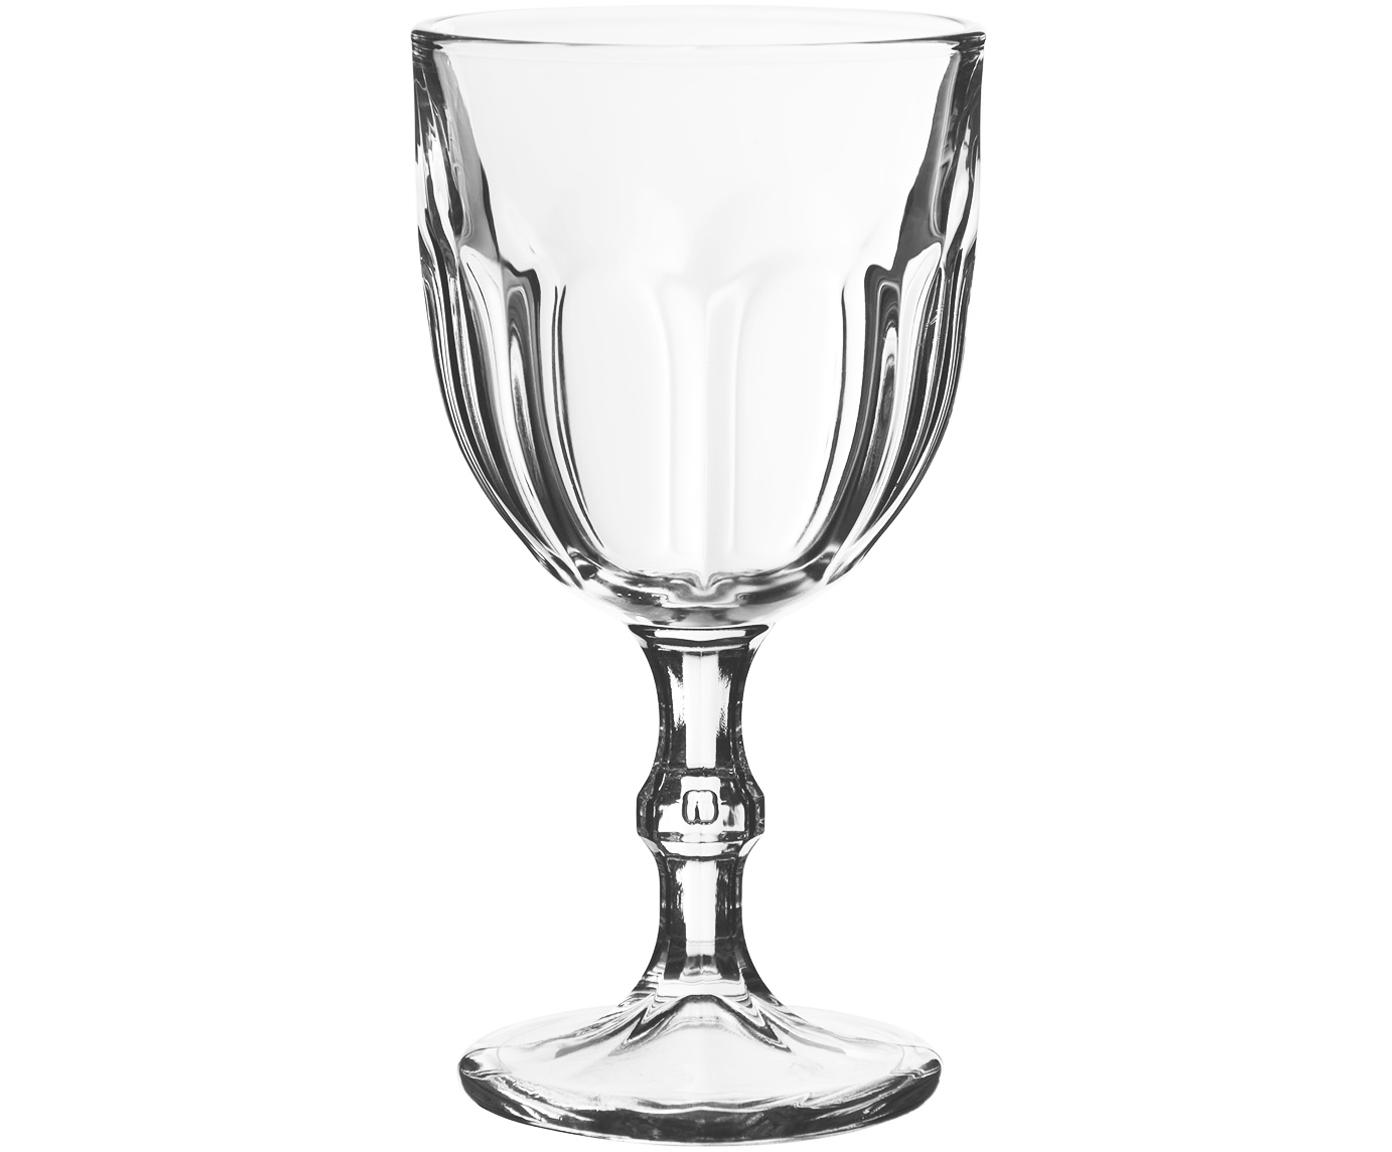 Bicchiere da vino con rilievo Lousanne 6 pz, Vetro, Trasparente, Ø 9 x Alt. 17 cm